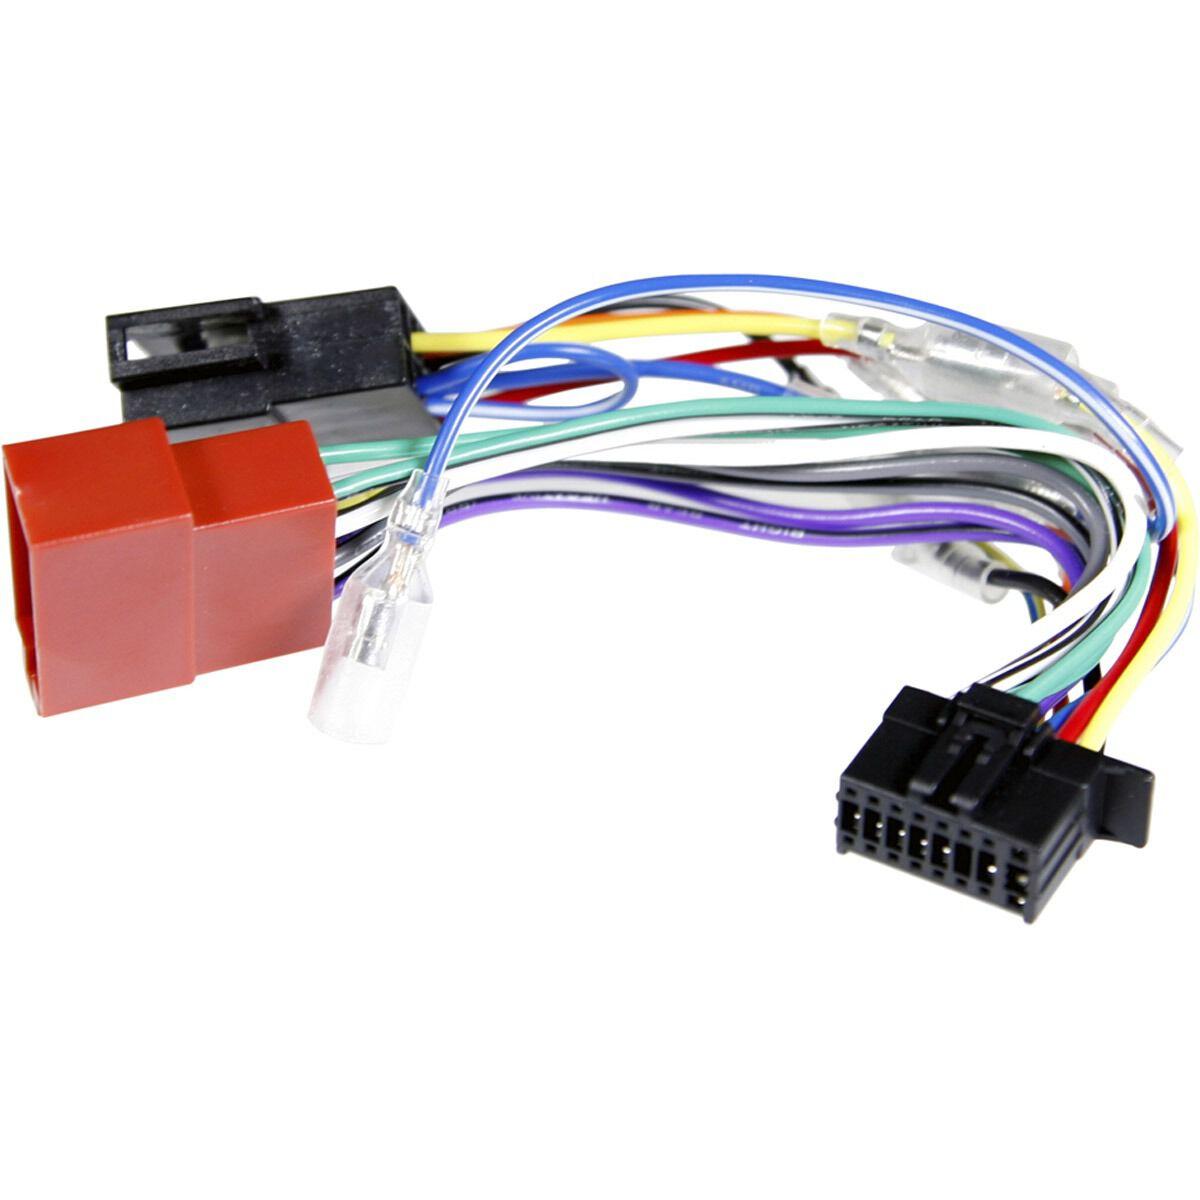 Jvc Wiring Harness Nz 1998 Lexus Gs 400 Wiring Diagram ... on car audio wiring, car speaker wiring, honeywell wiring, kicker wiring, kenwood wiring, vintage stereo wiring, bosch wiring, rca wiring, pioneer wiring, nasa wiring, klipsch wiring, bose wiring,